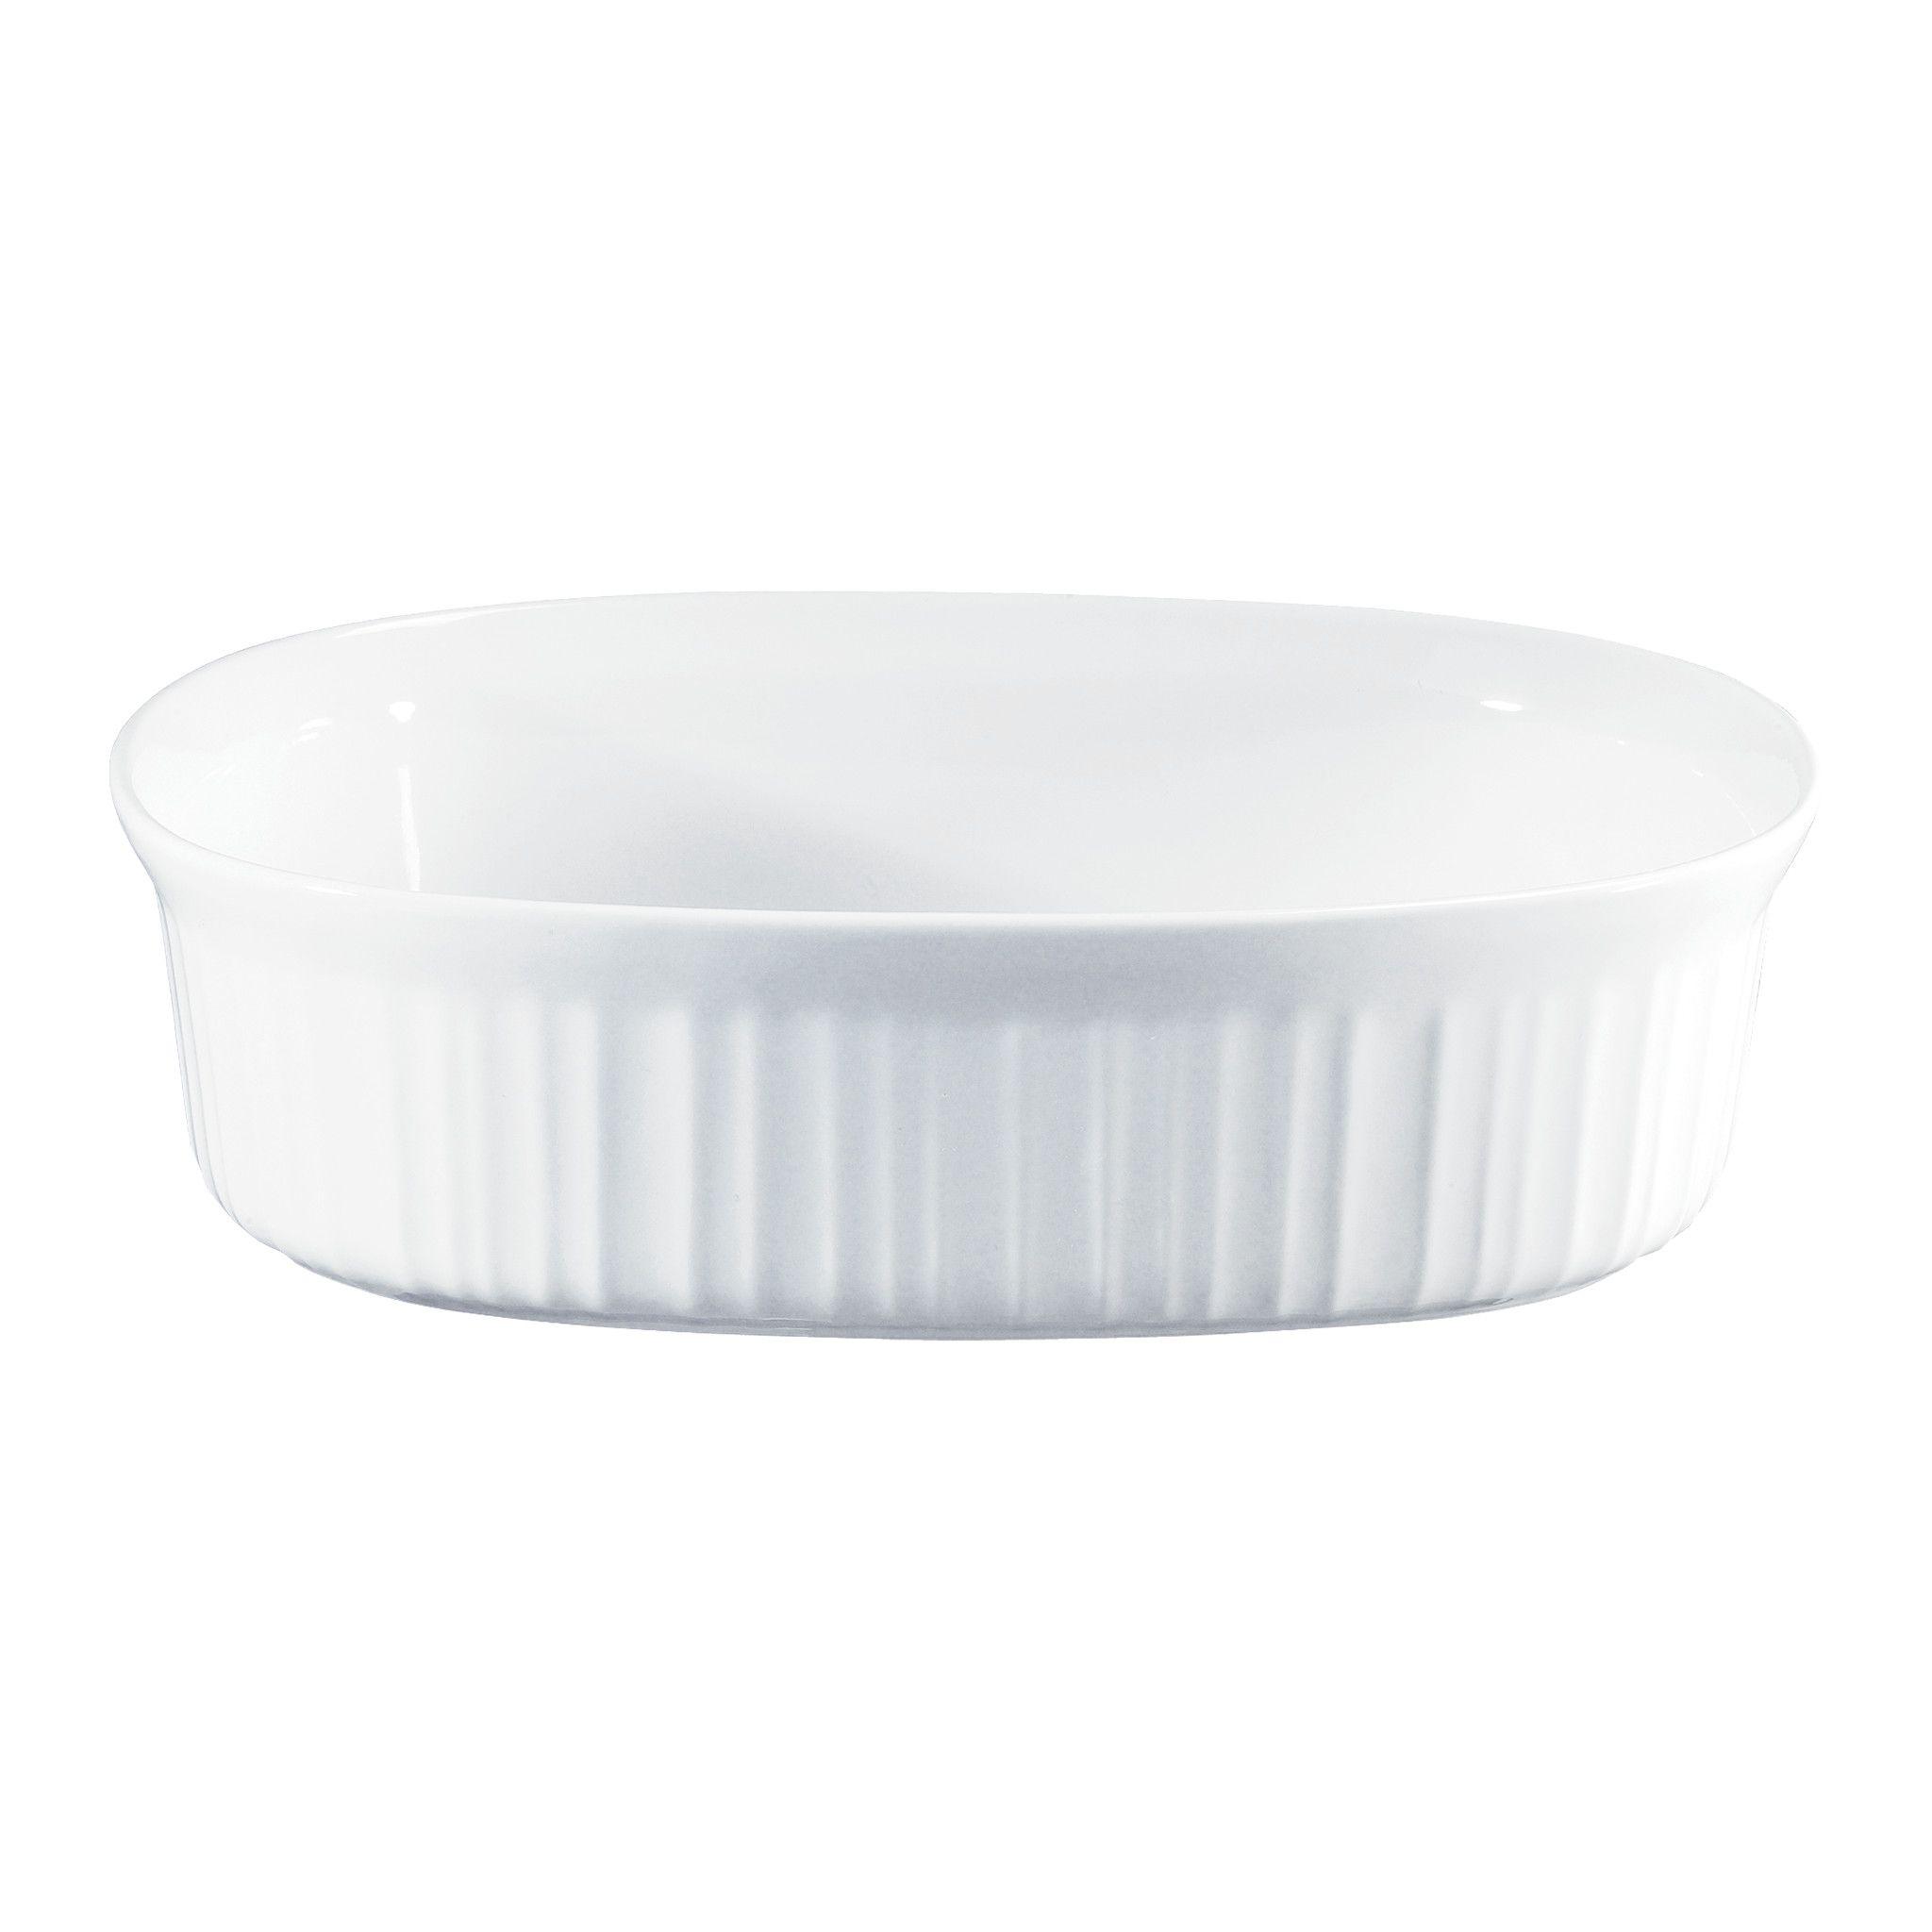 5 Quart A-5-B Corning Ware White Coupe Square Casserole w// Lid